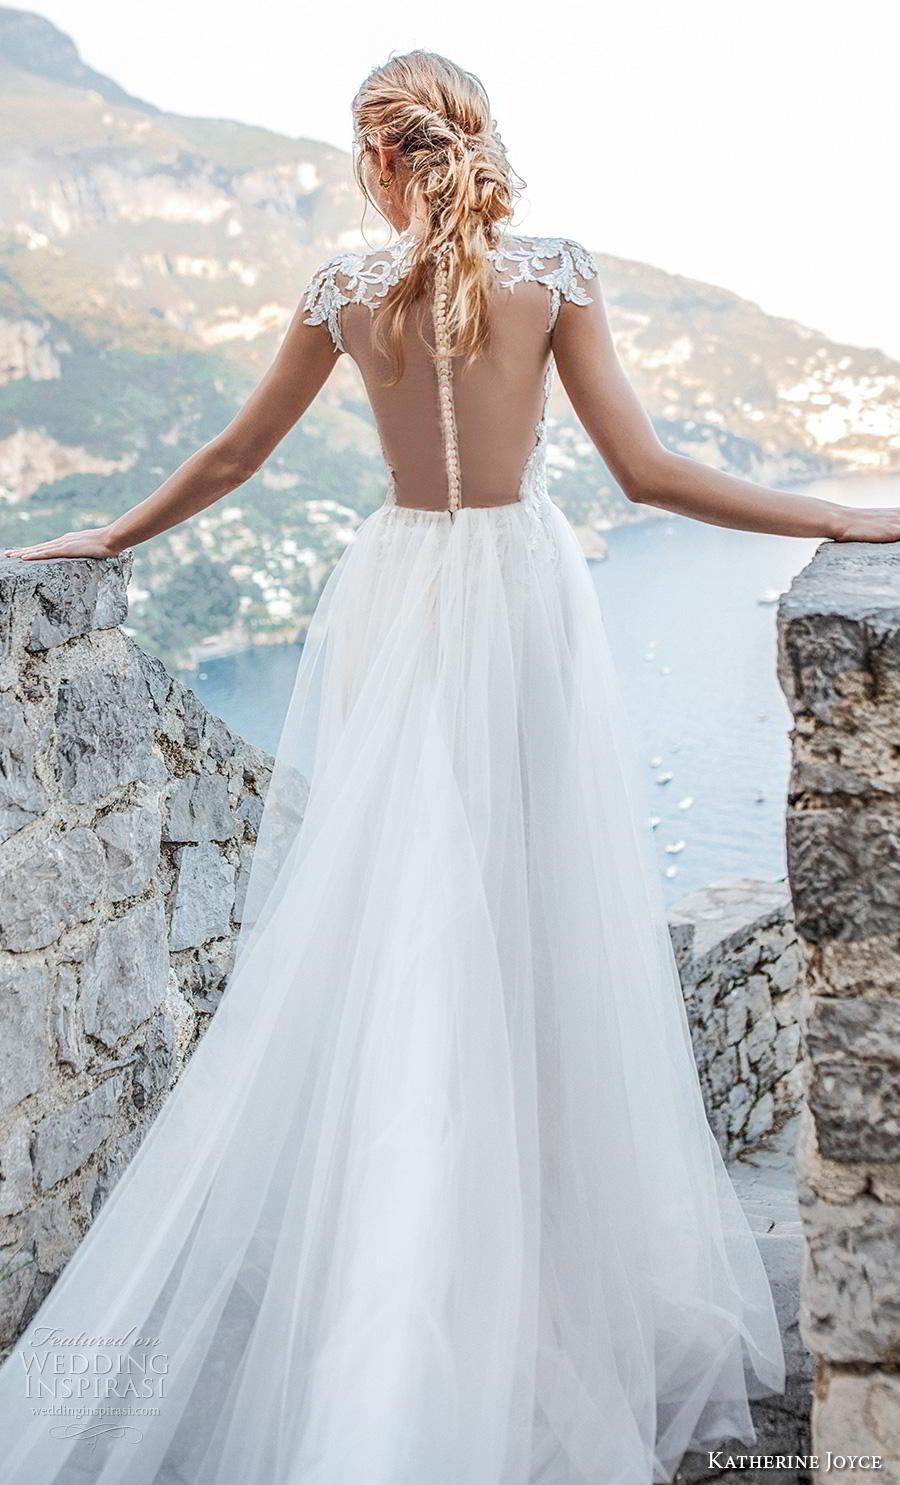 katherine joyce 2019 bridal cap sleeves illusion high neck heavily embellished bodice glamorous romantic a  line wedding dress sheer button back chapel train (8) zbv